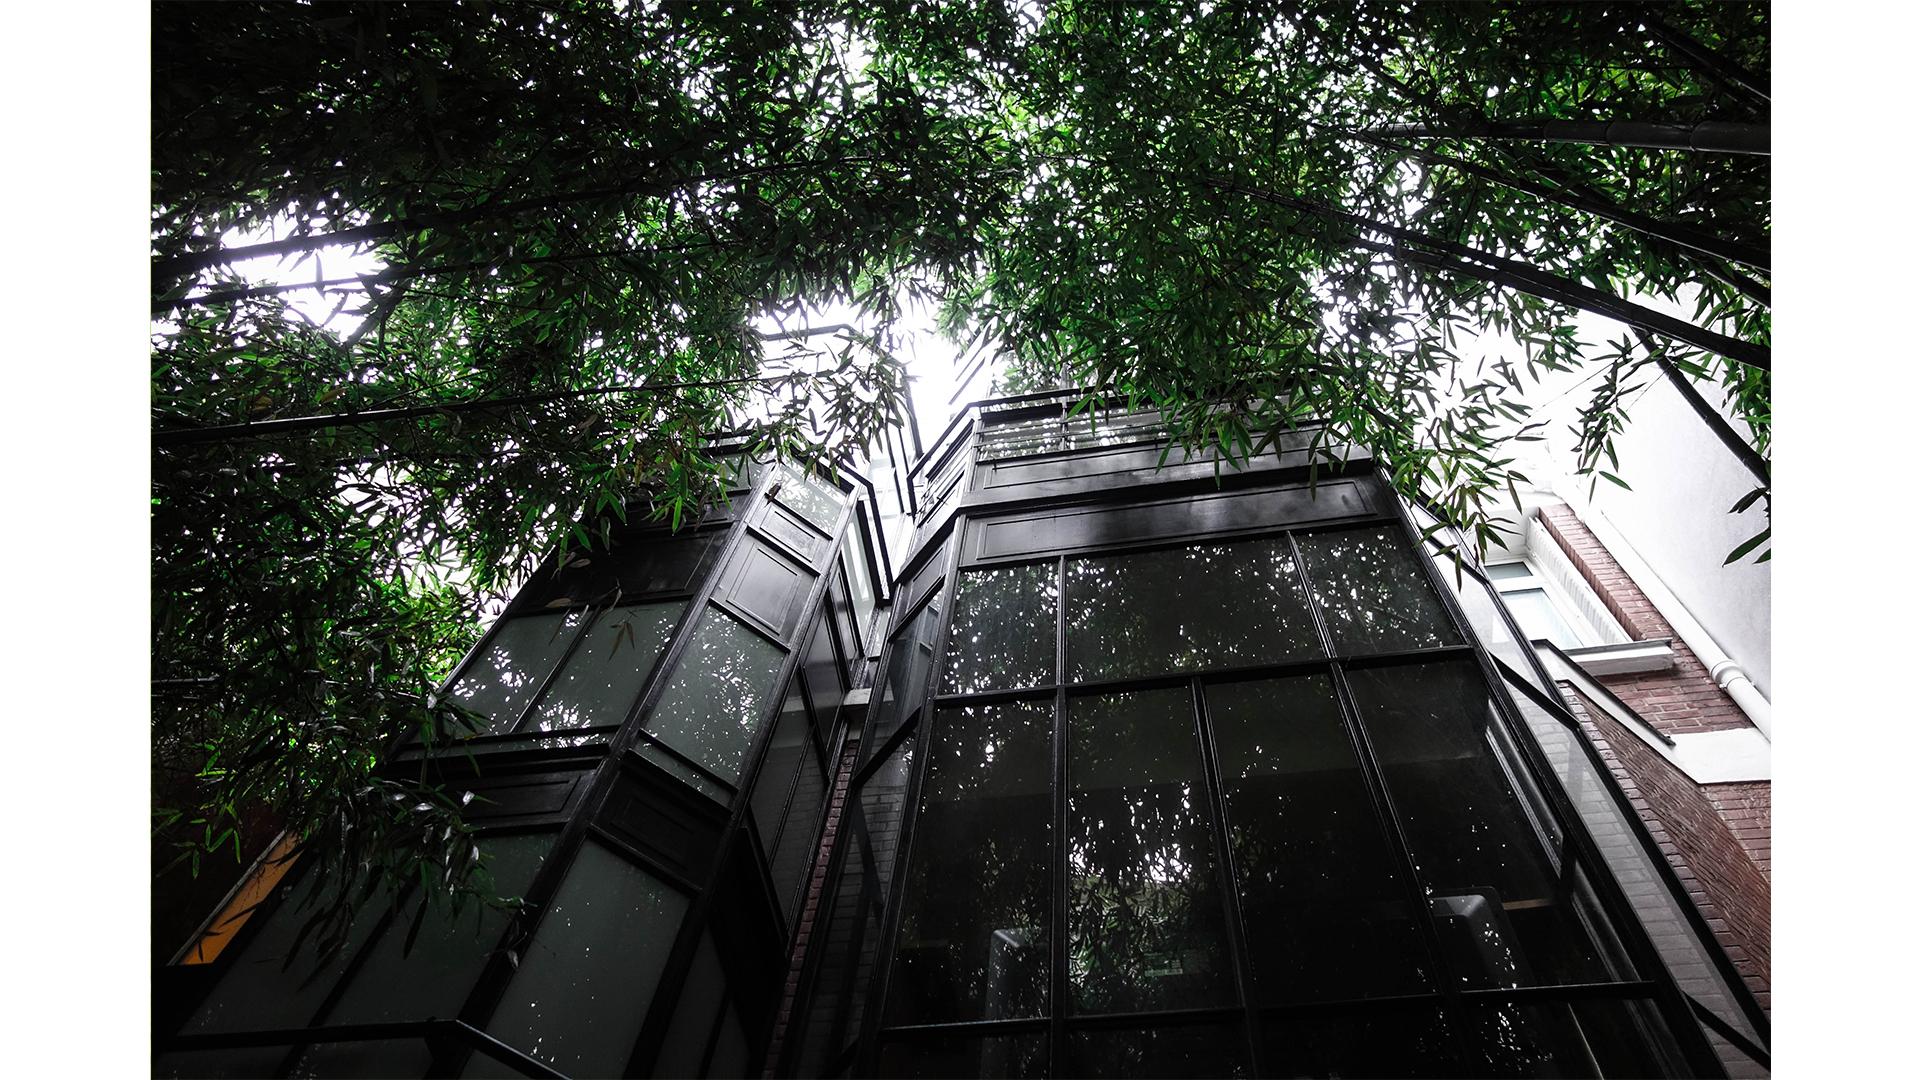 Bordures De Jardin Queguiner > La Terrasse Du Jardin Neuilly Orleans Maison Design Trivid Us